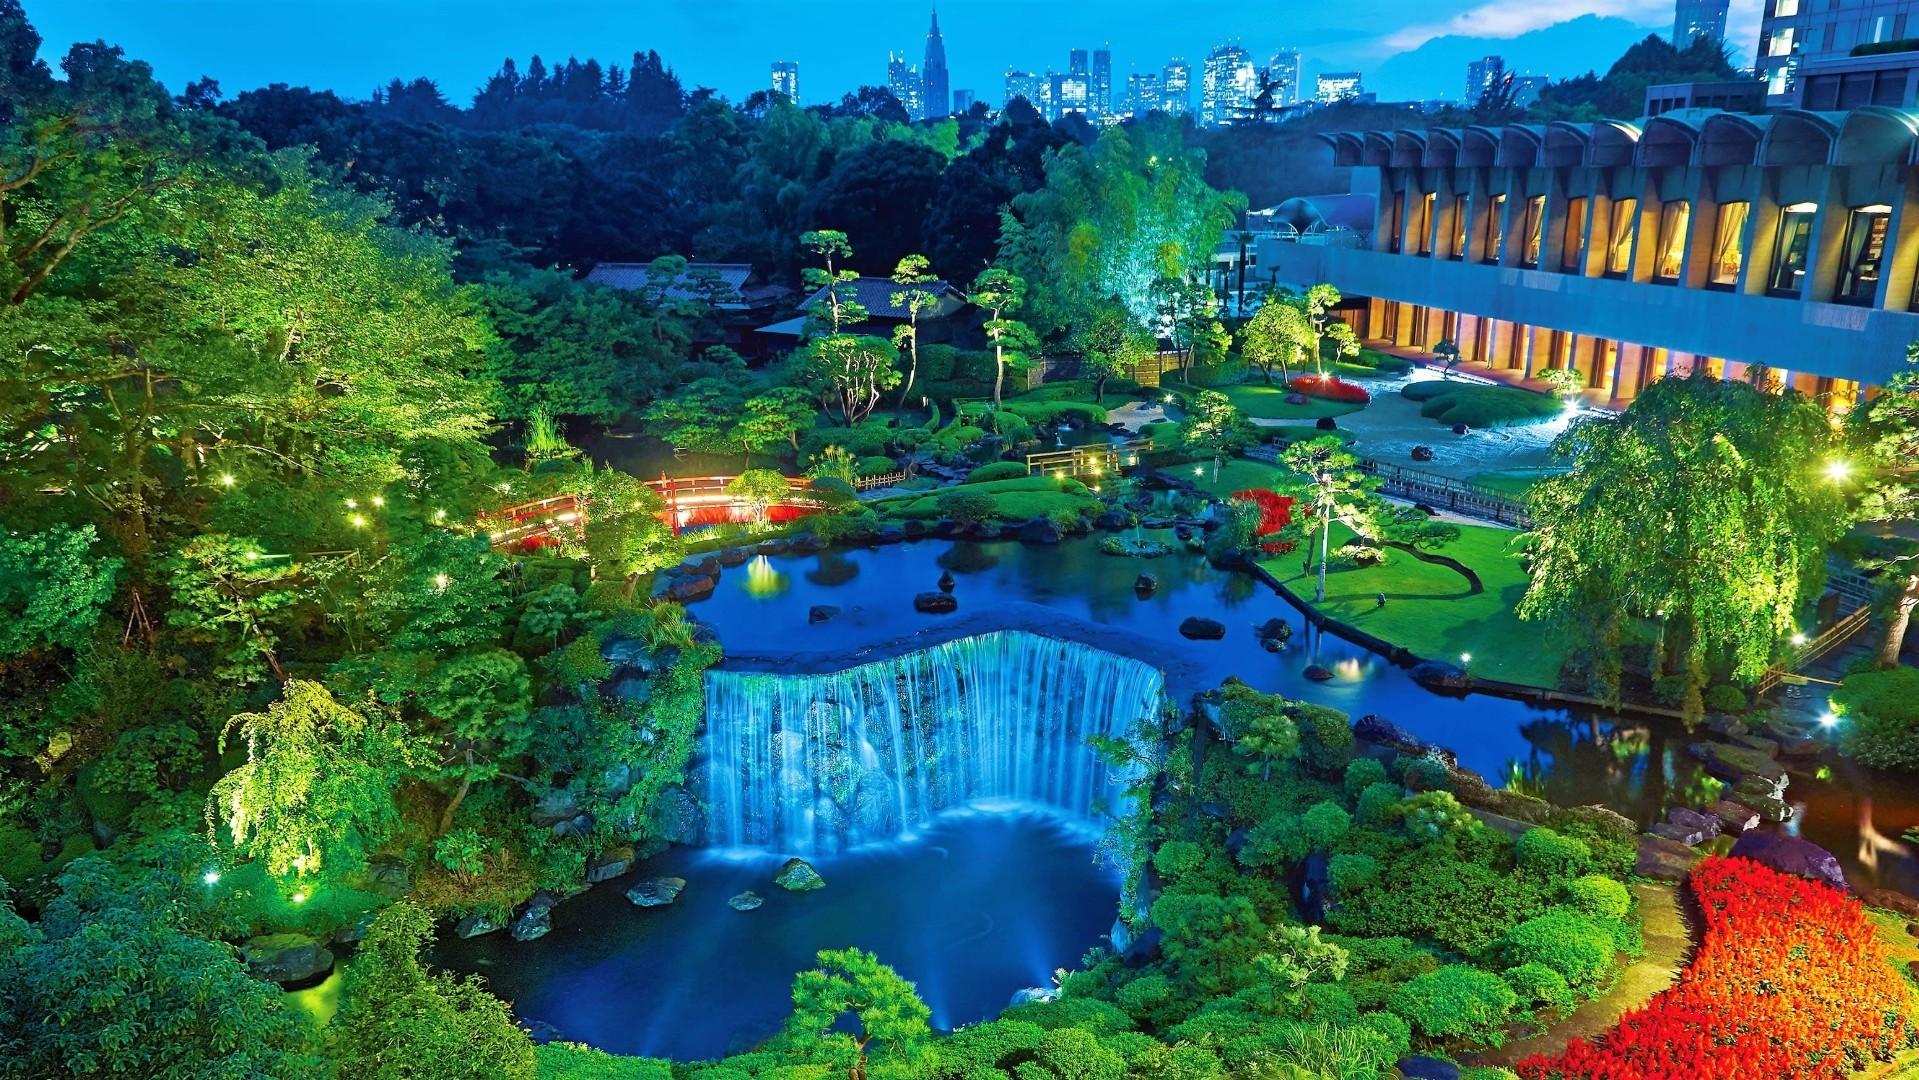 Hotel New Otani Landscape Garden